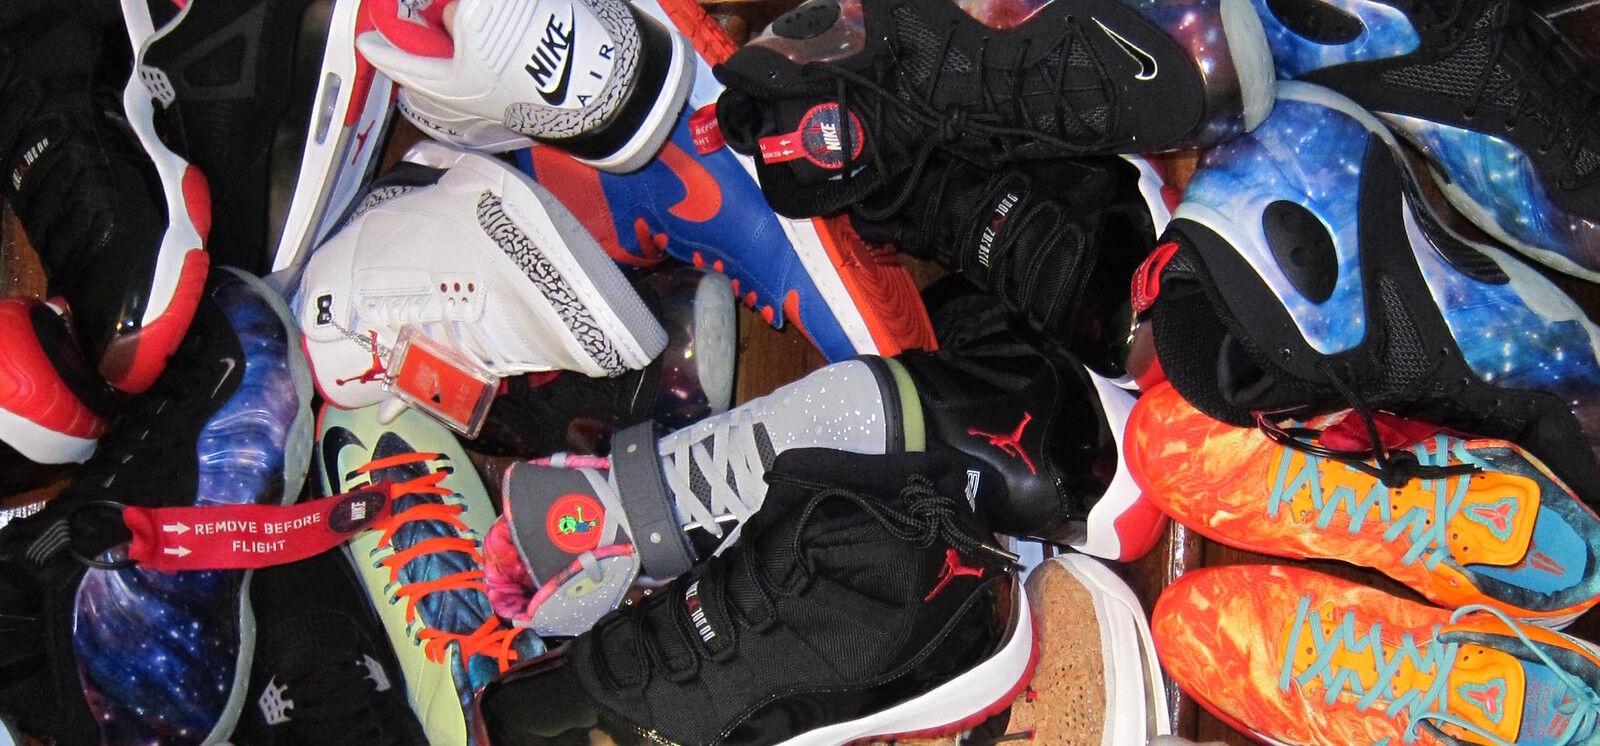 Qsup's Sneaker Shop